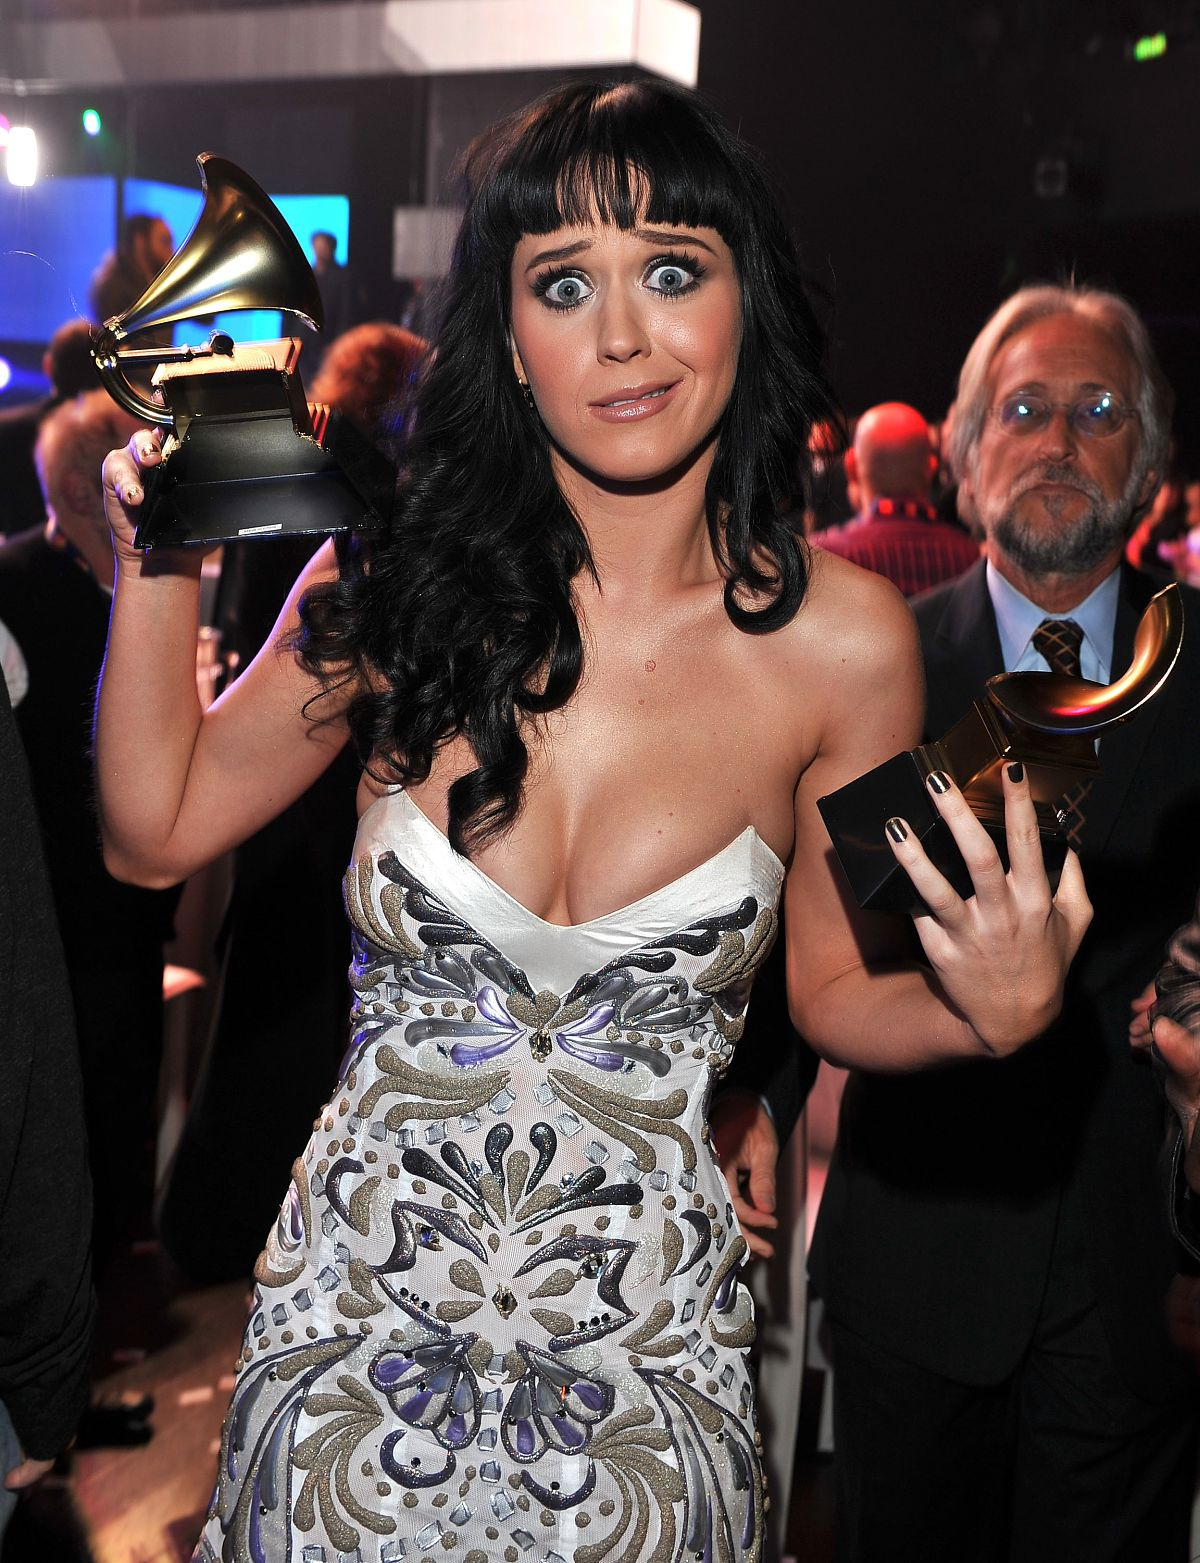 http://2.bp.blogspot.com/_I0sctaBuCPU/TNqqsIoPMDI/AAAAAAAAABs/qdUyyfTyC2g/s1600/katy-perry-grammy-nominations-2010-pictures-4.jpg